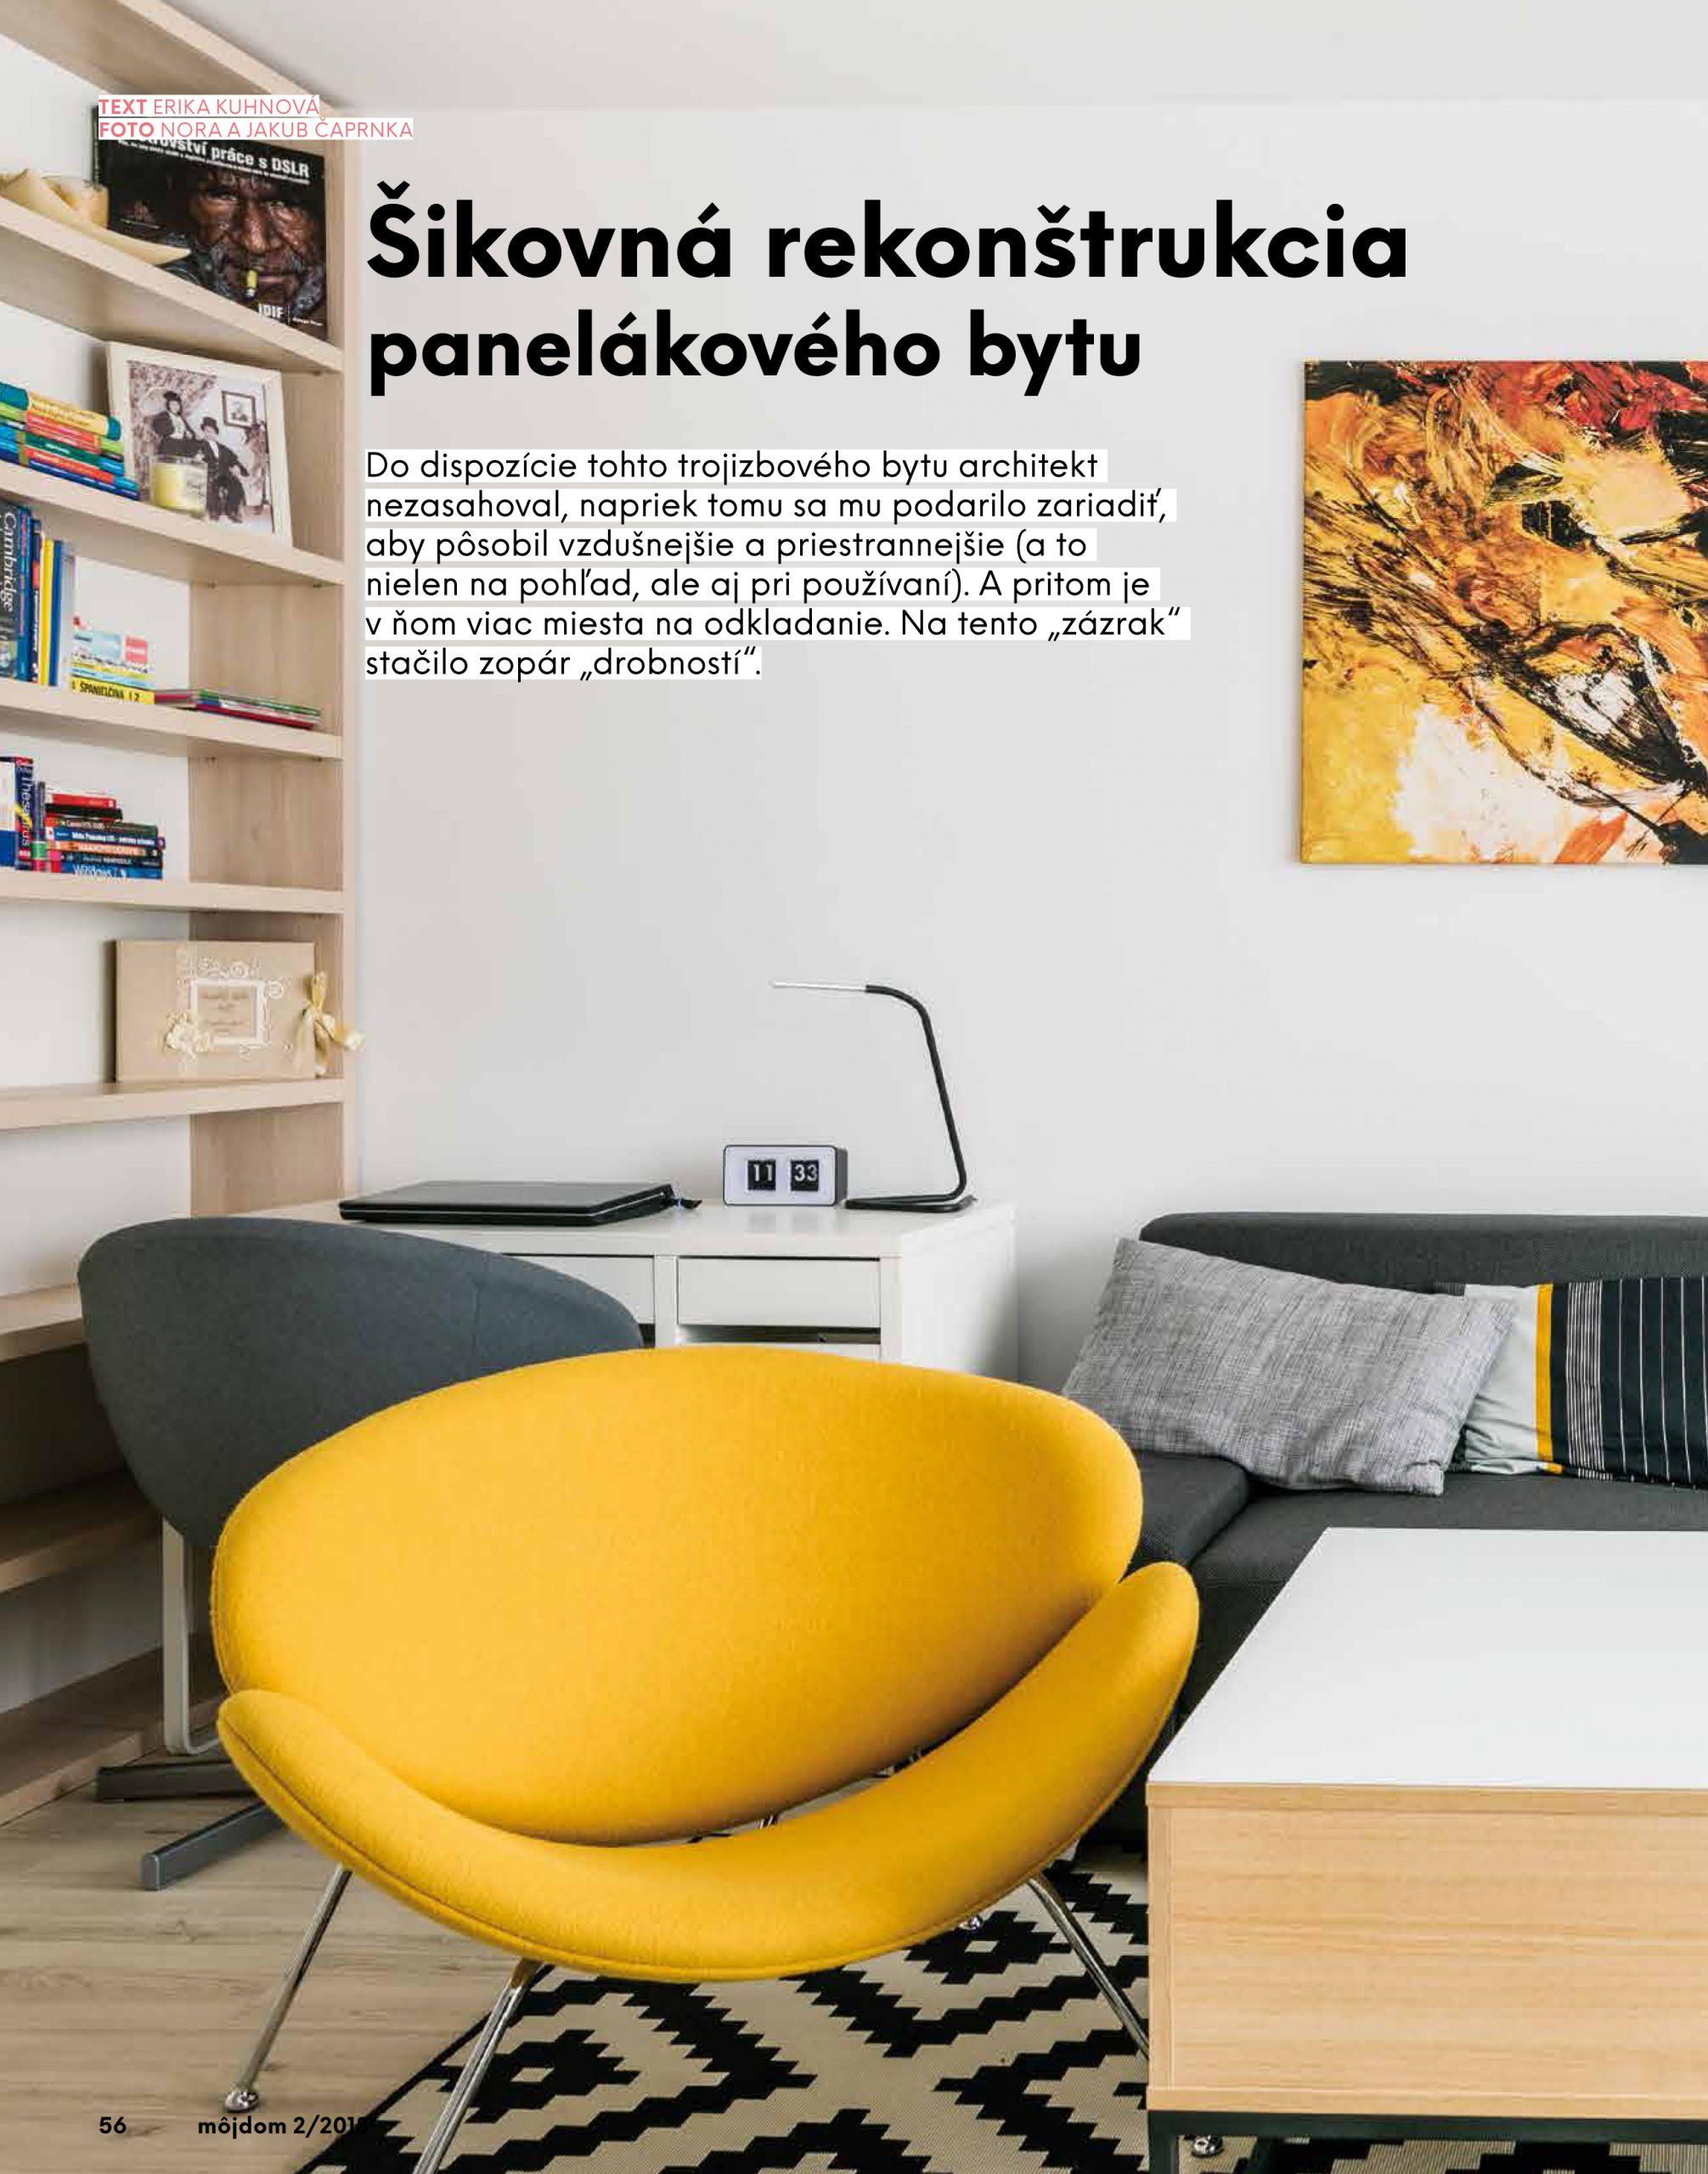 001-byt-cachtice-rekonstrukcia-interier-mojdom-pavlech-architekti